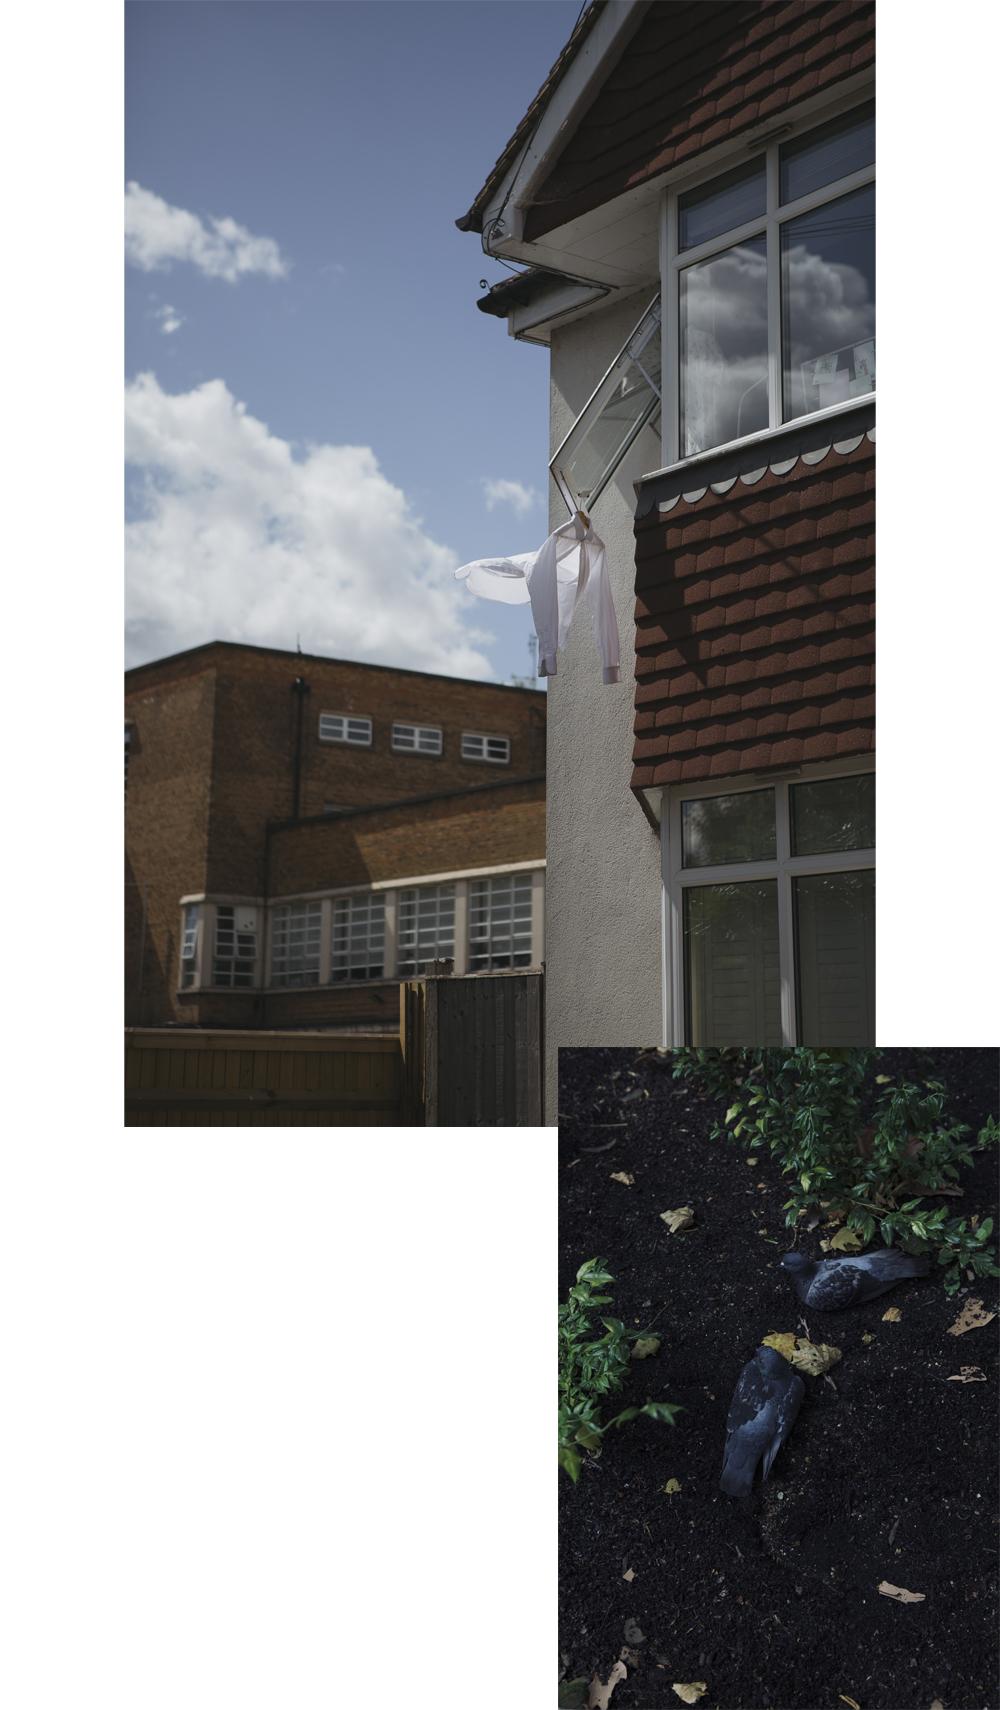 8a_London_by_Amelie_Niederbuchner, London, Visual Diary, shot by Amelie Niederbuchner, photographer from Munich, blog The Curly Head